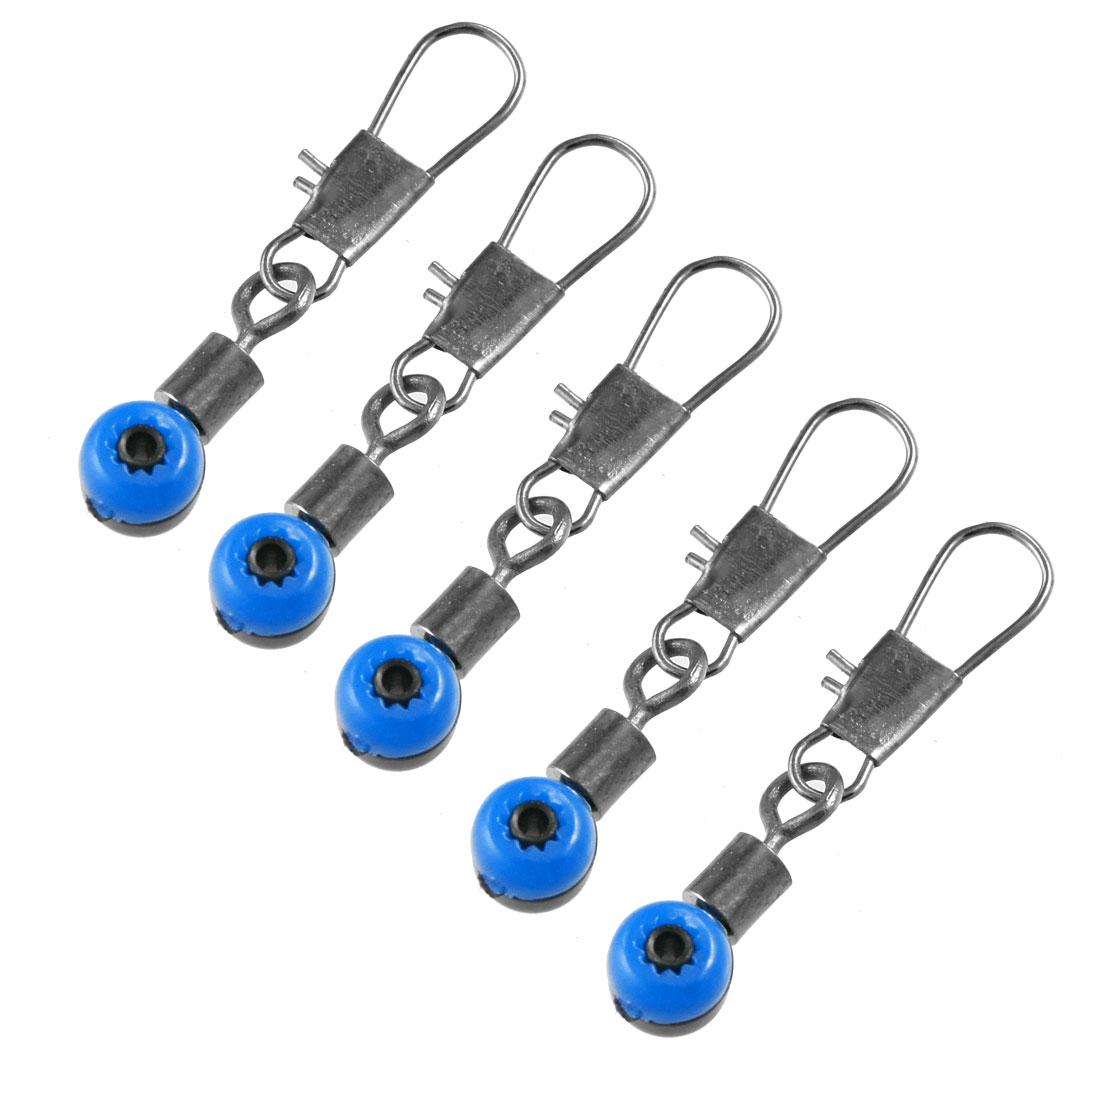 5 Pcs Line to Hook Fishing Crane Swivel Interlock Ring Connector